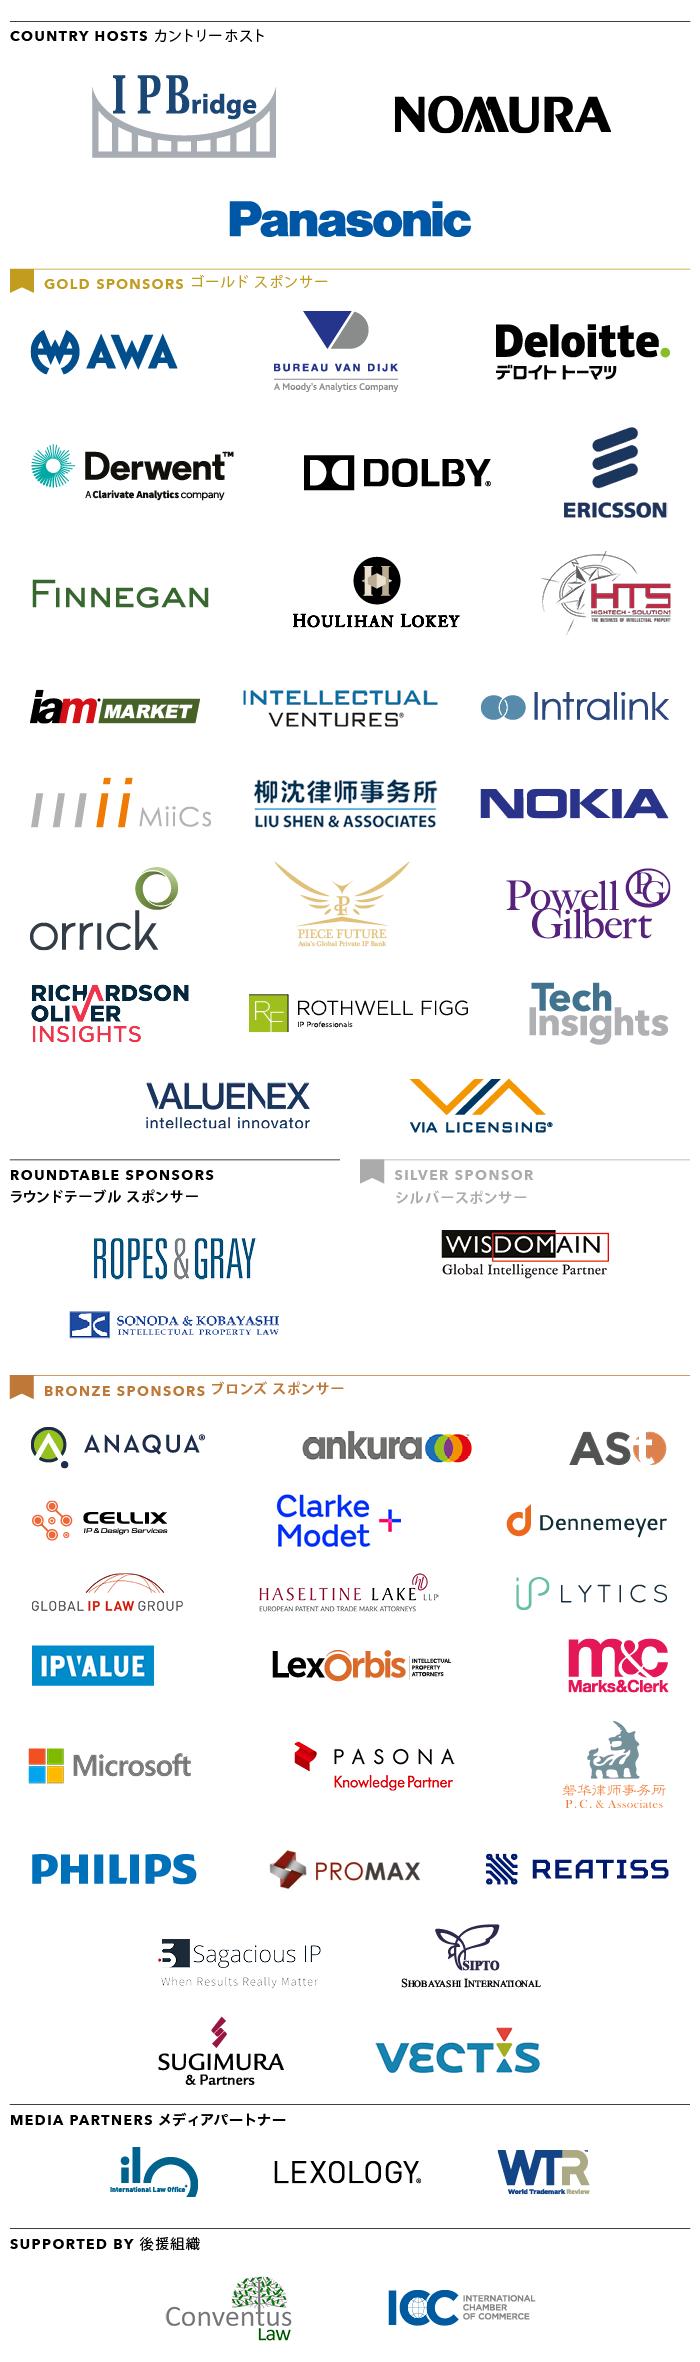 STO-5794 IPBC Asia 2019 - sponsor - partner image